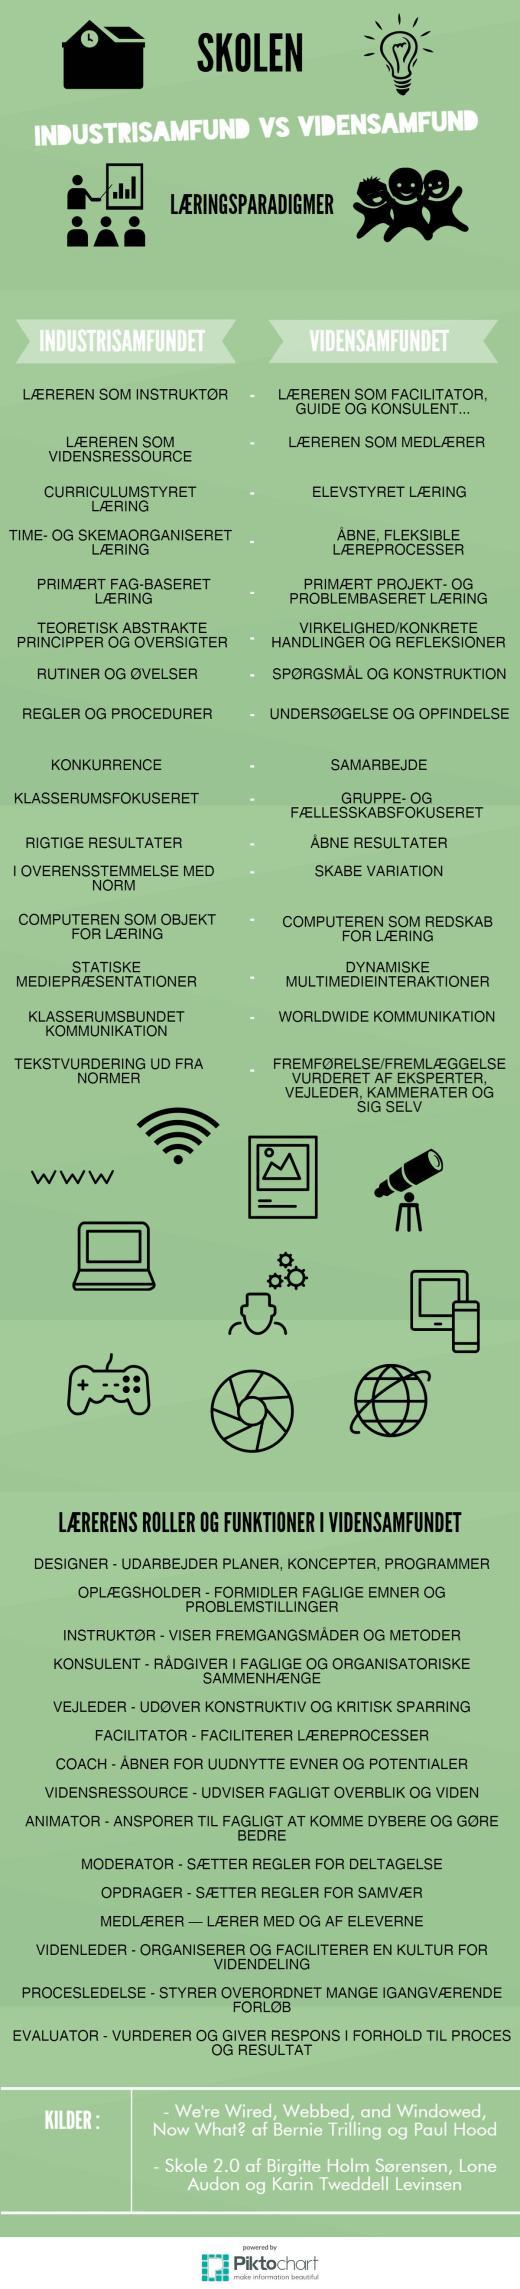 industrisamfund-vs-vidensamfund-2